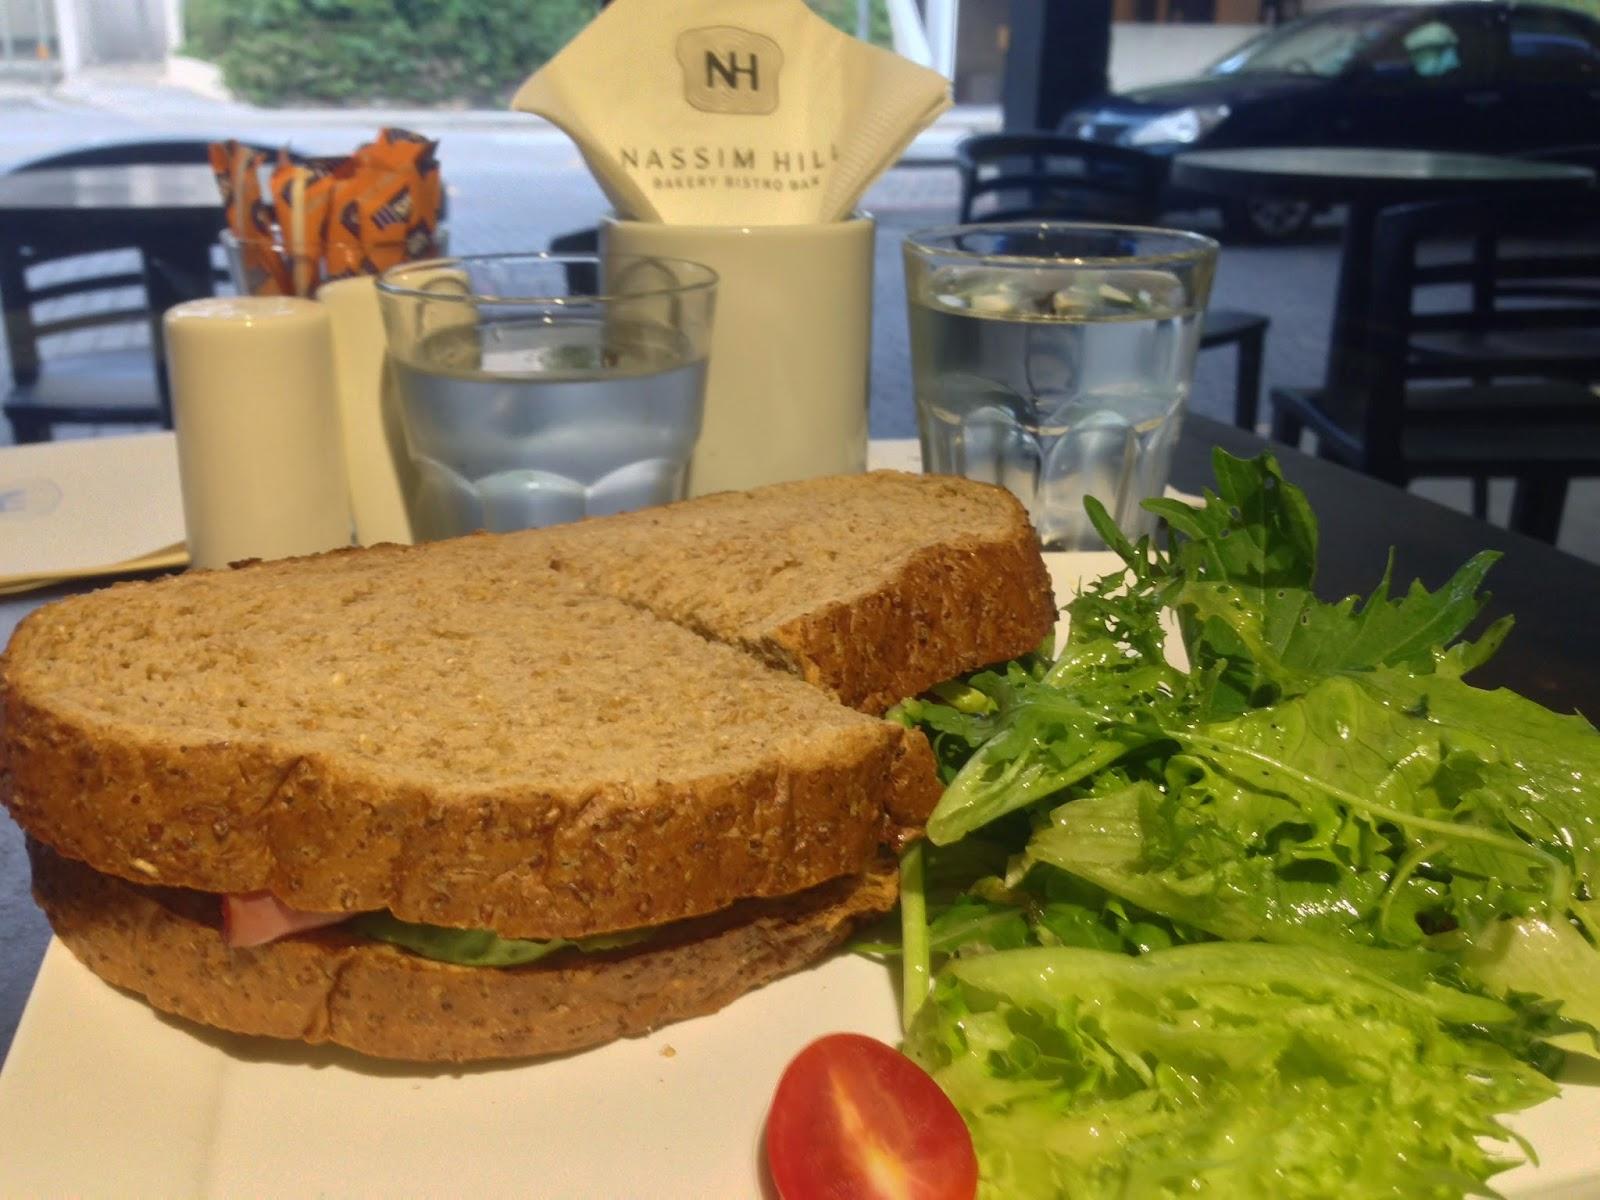 Ham & Cheese Sandwich with Honey Baked Ham, Emmental, Lettuce and Tomato on Asahi Kuronama Beer Bread